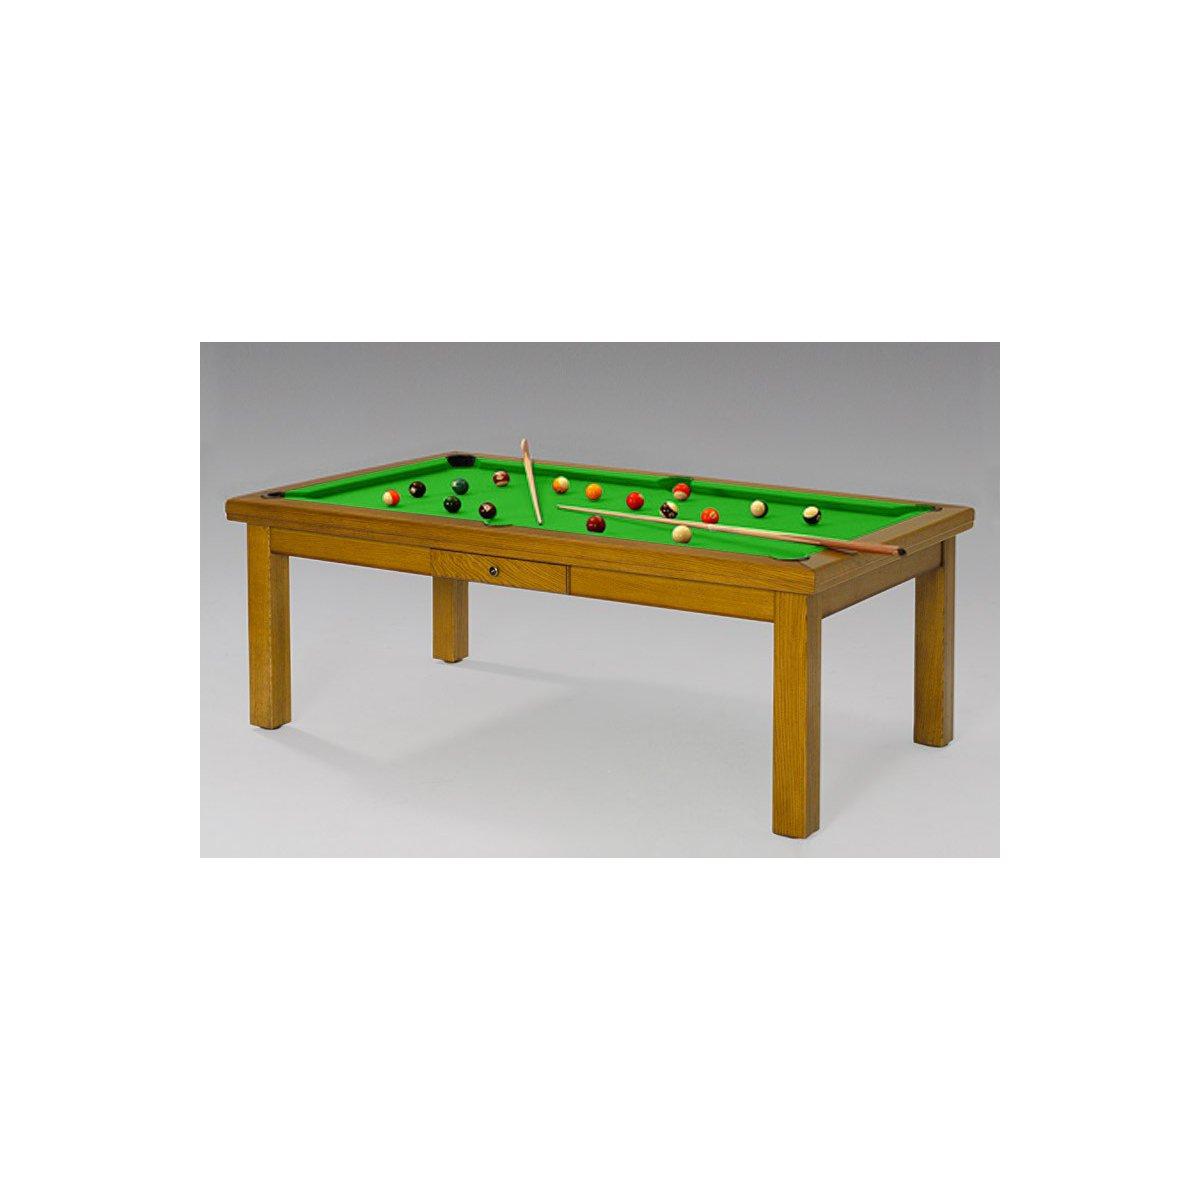 billard convertible table galerie de photos de table billard convertible belgique table billard. Black Bedroom Furniture Sets. Home Design Ideas